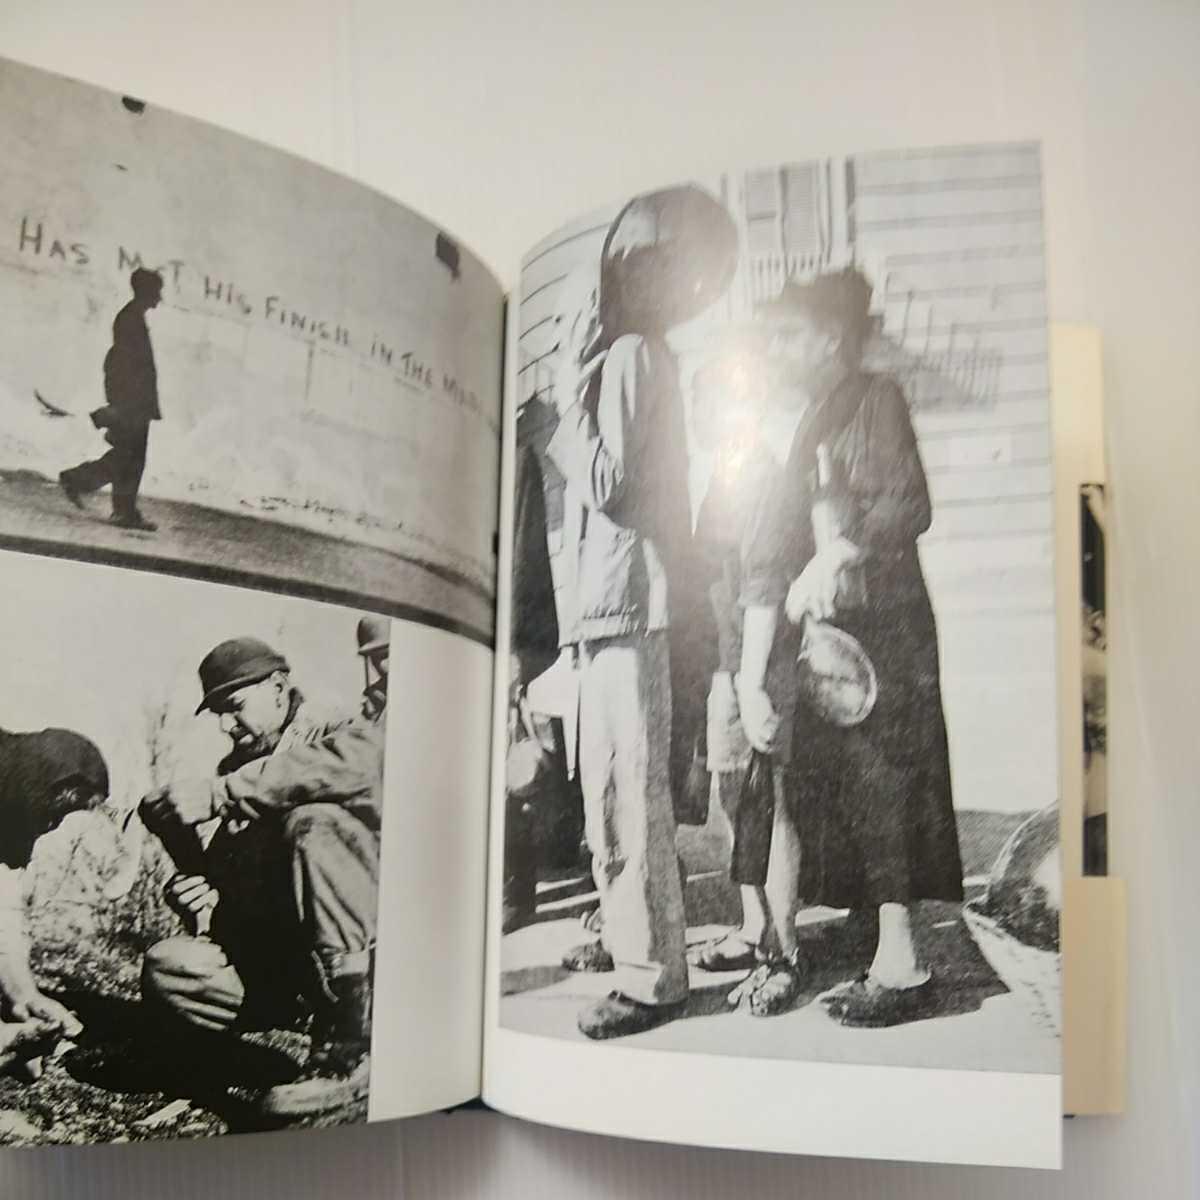 zaa-063♪ちょっとピンぼけ 単行本 1975/4/1 14版 ロバート・キャパ (著), 川添 浩史 (翻訳), 井上 清一 (翻訳)ダヴィット社